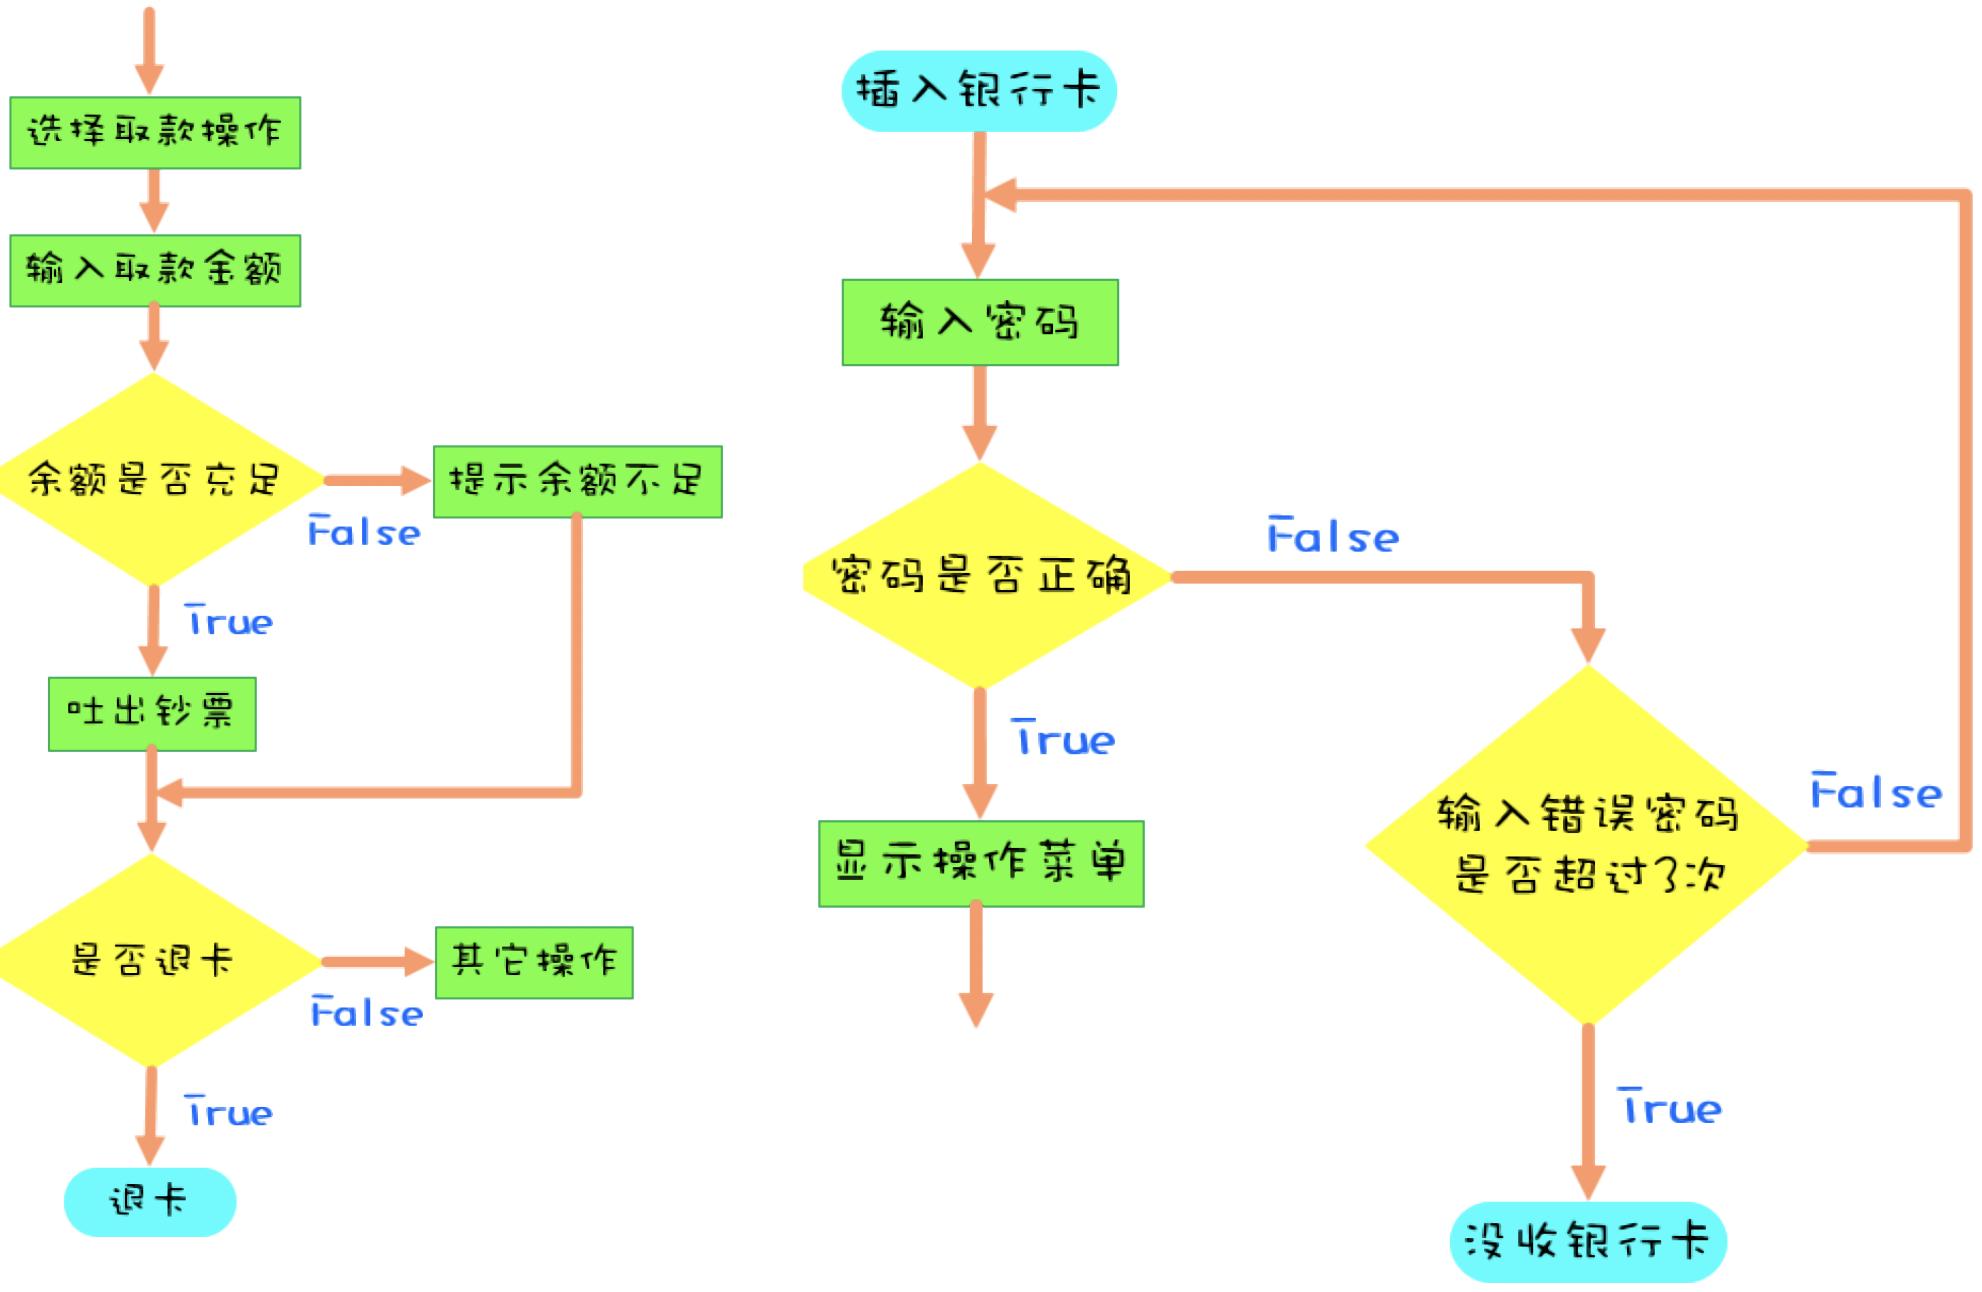 11流程控制.png